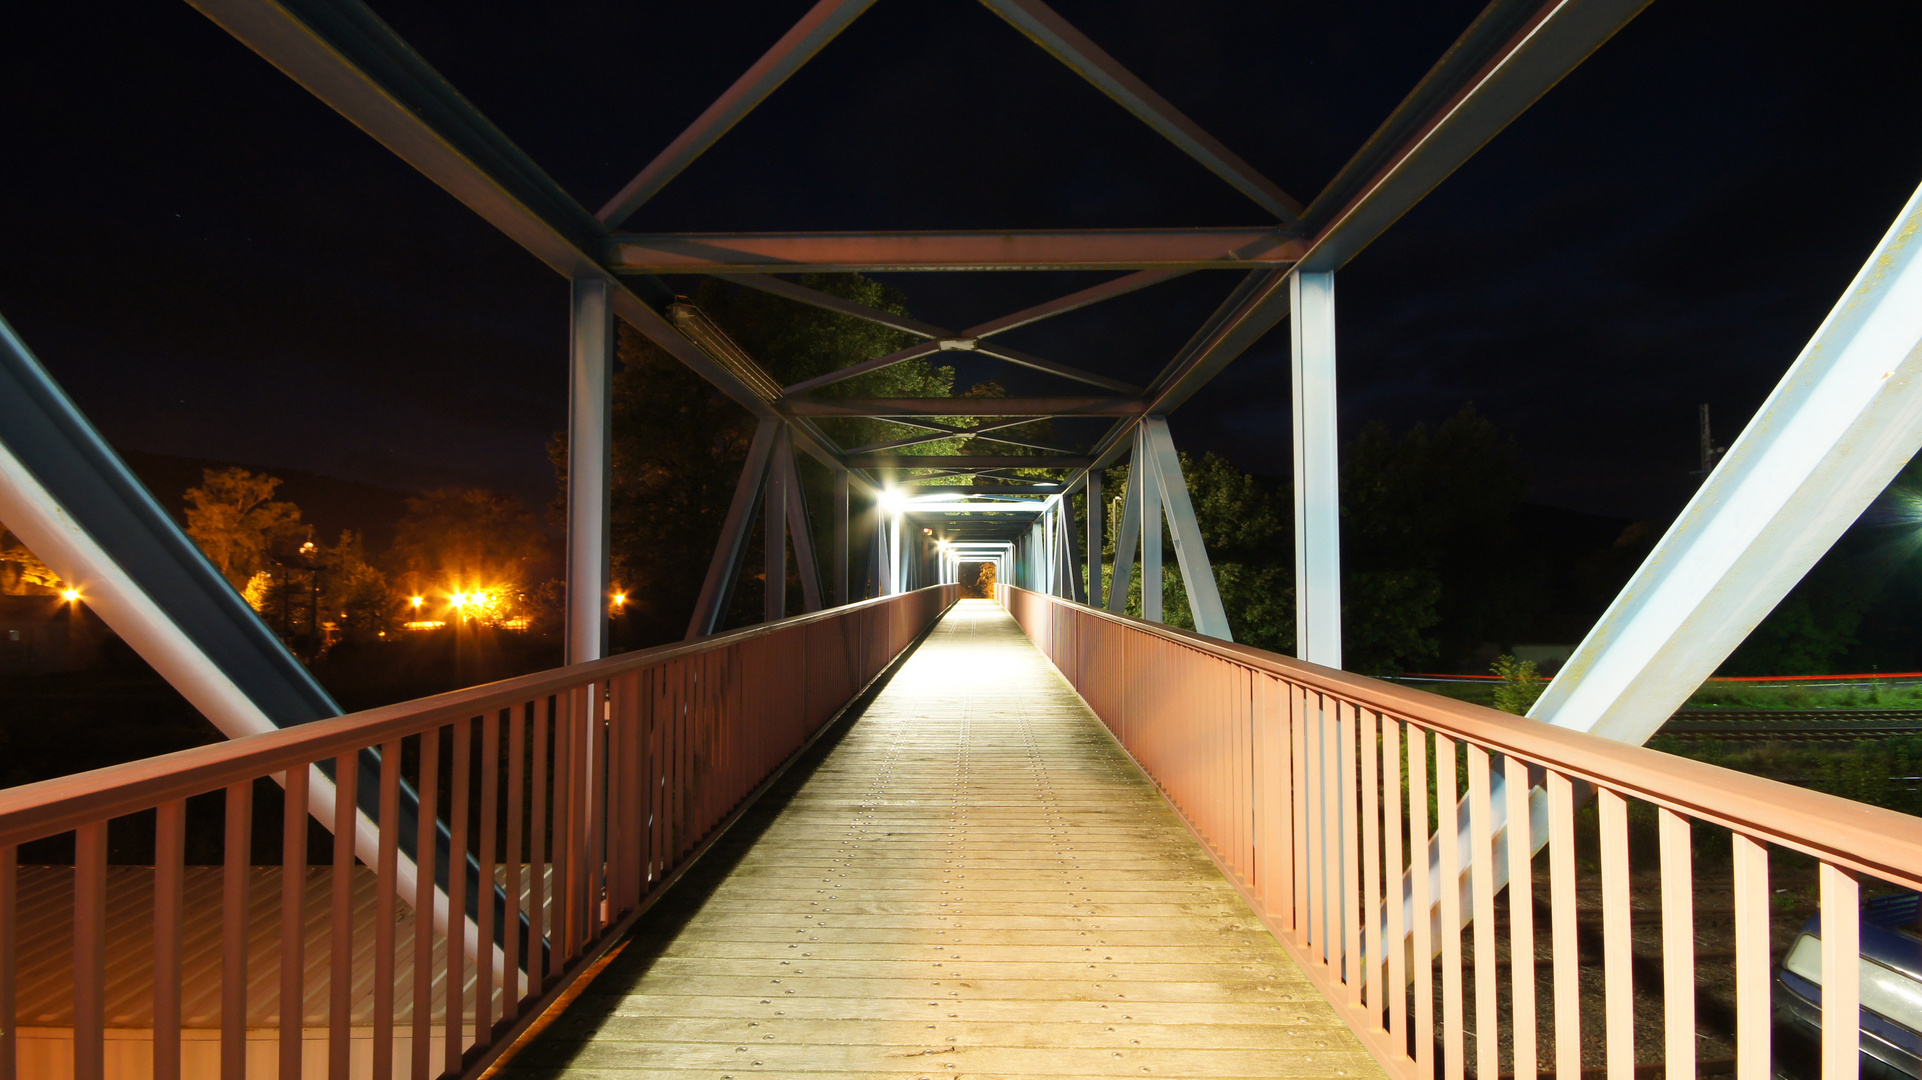 Fußgängerbrücke am Bahnhof Themar